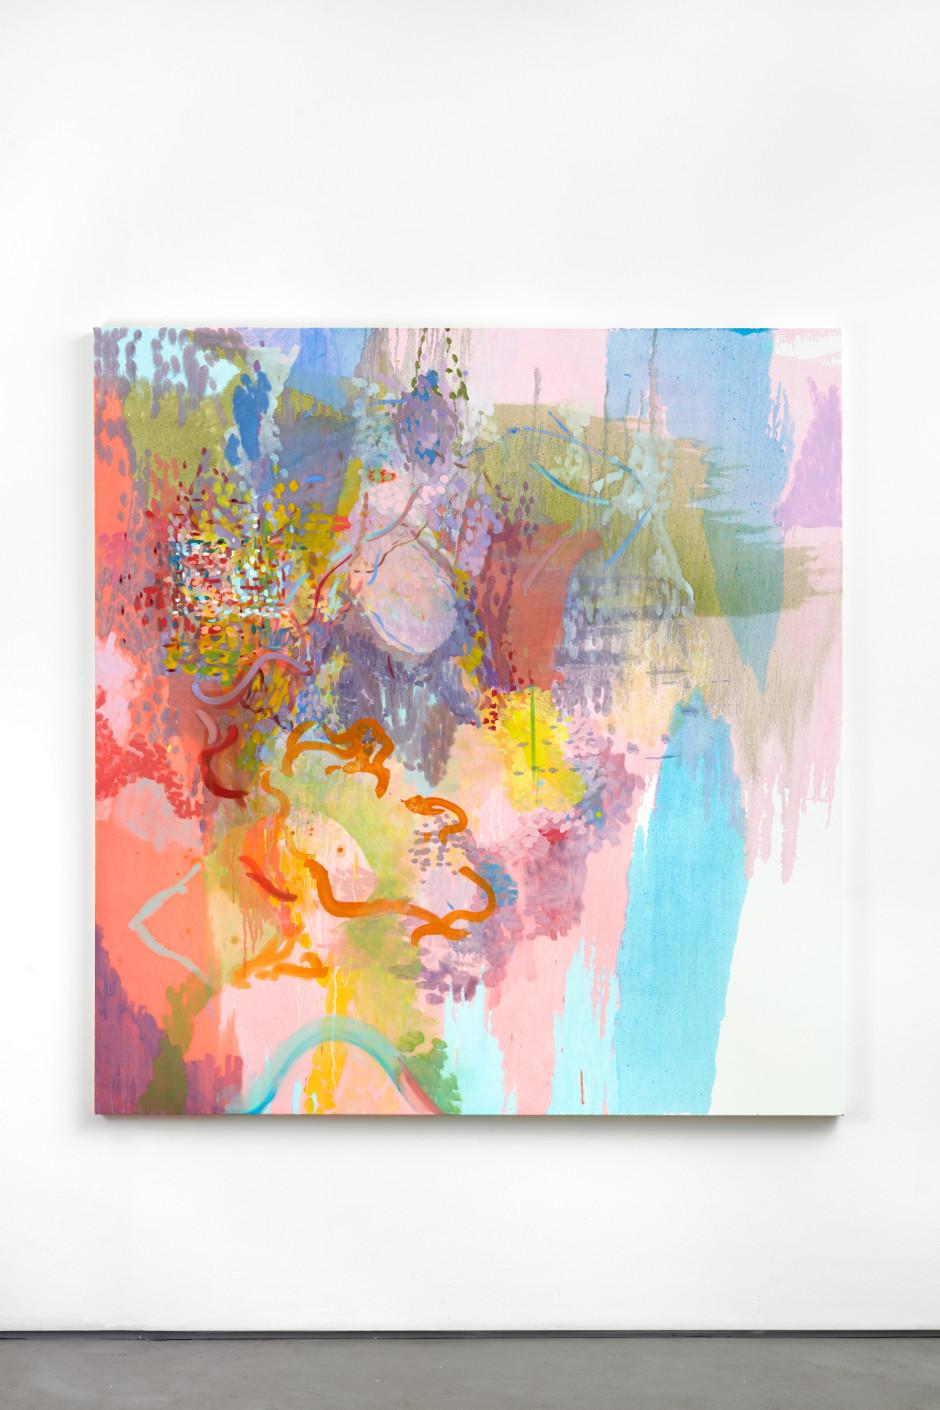 Love Scene, 2018  oil on canvas  190.5 x 180.5 x 3.5 cm  75 x 71 x 1 ⅜ in.